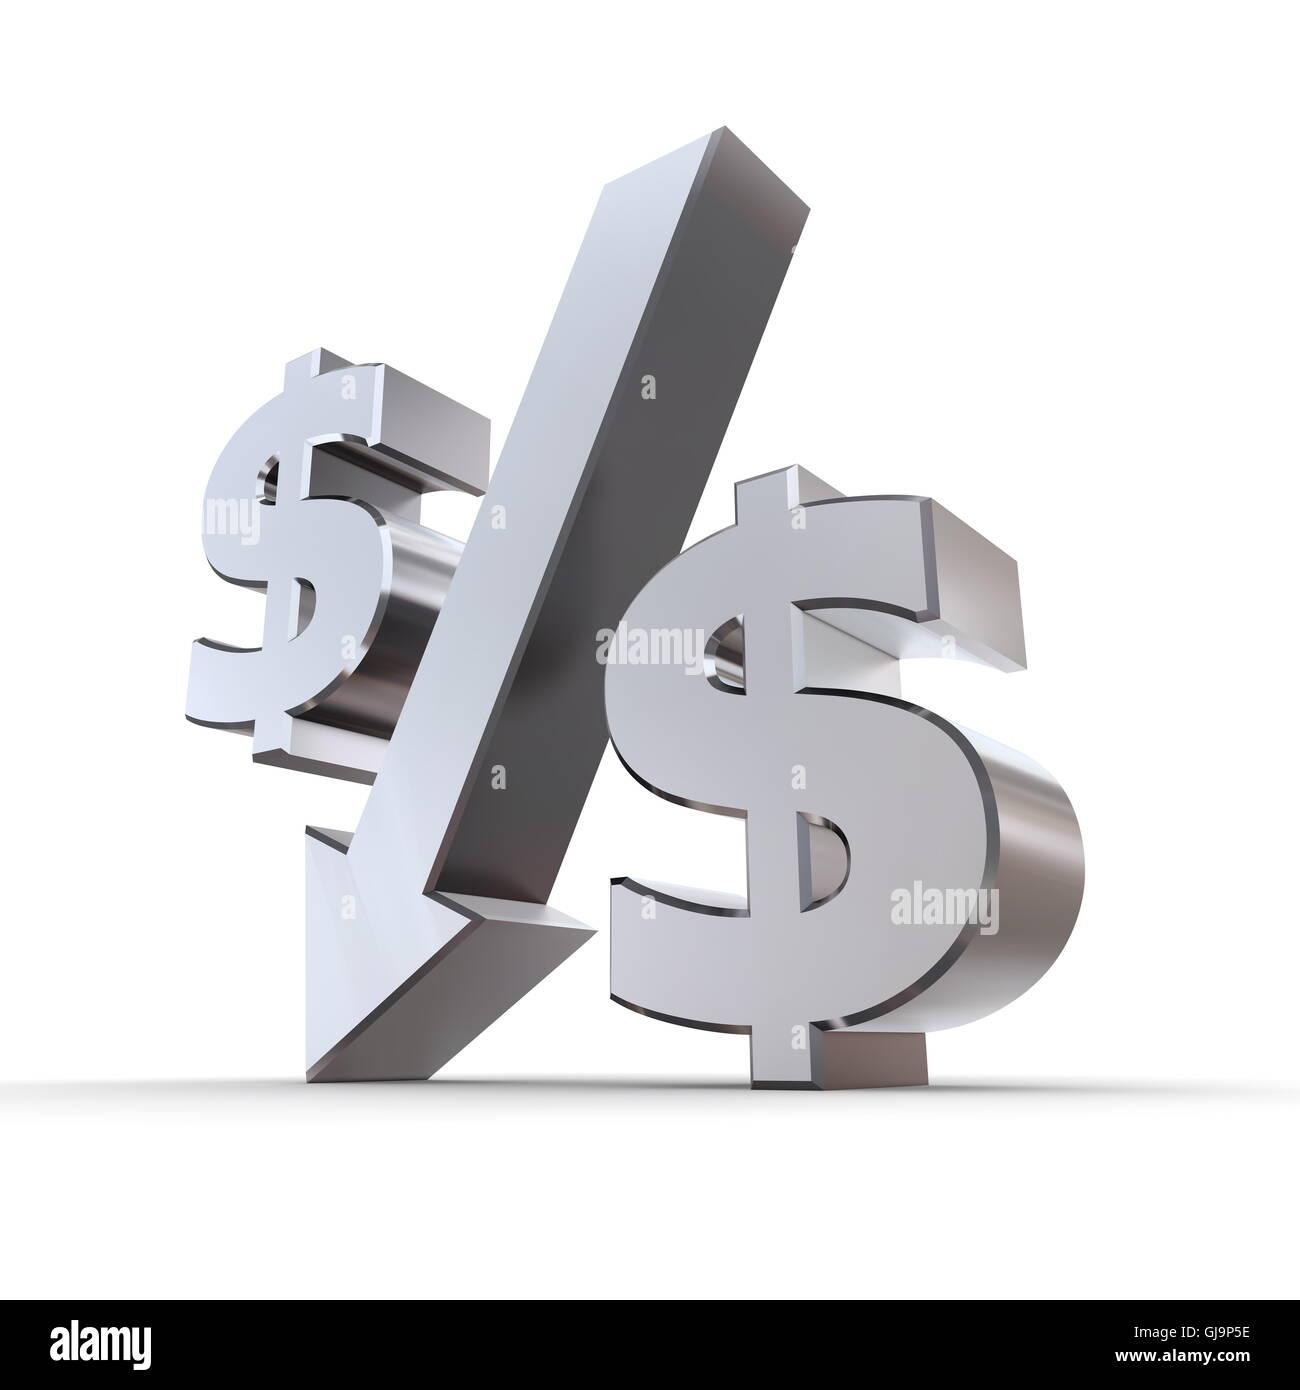 Shiny Dollar Percentage Down - Stock Image